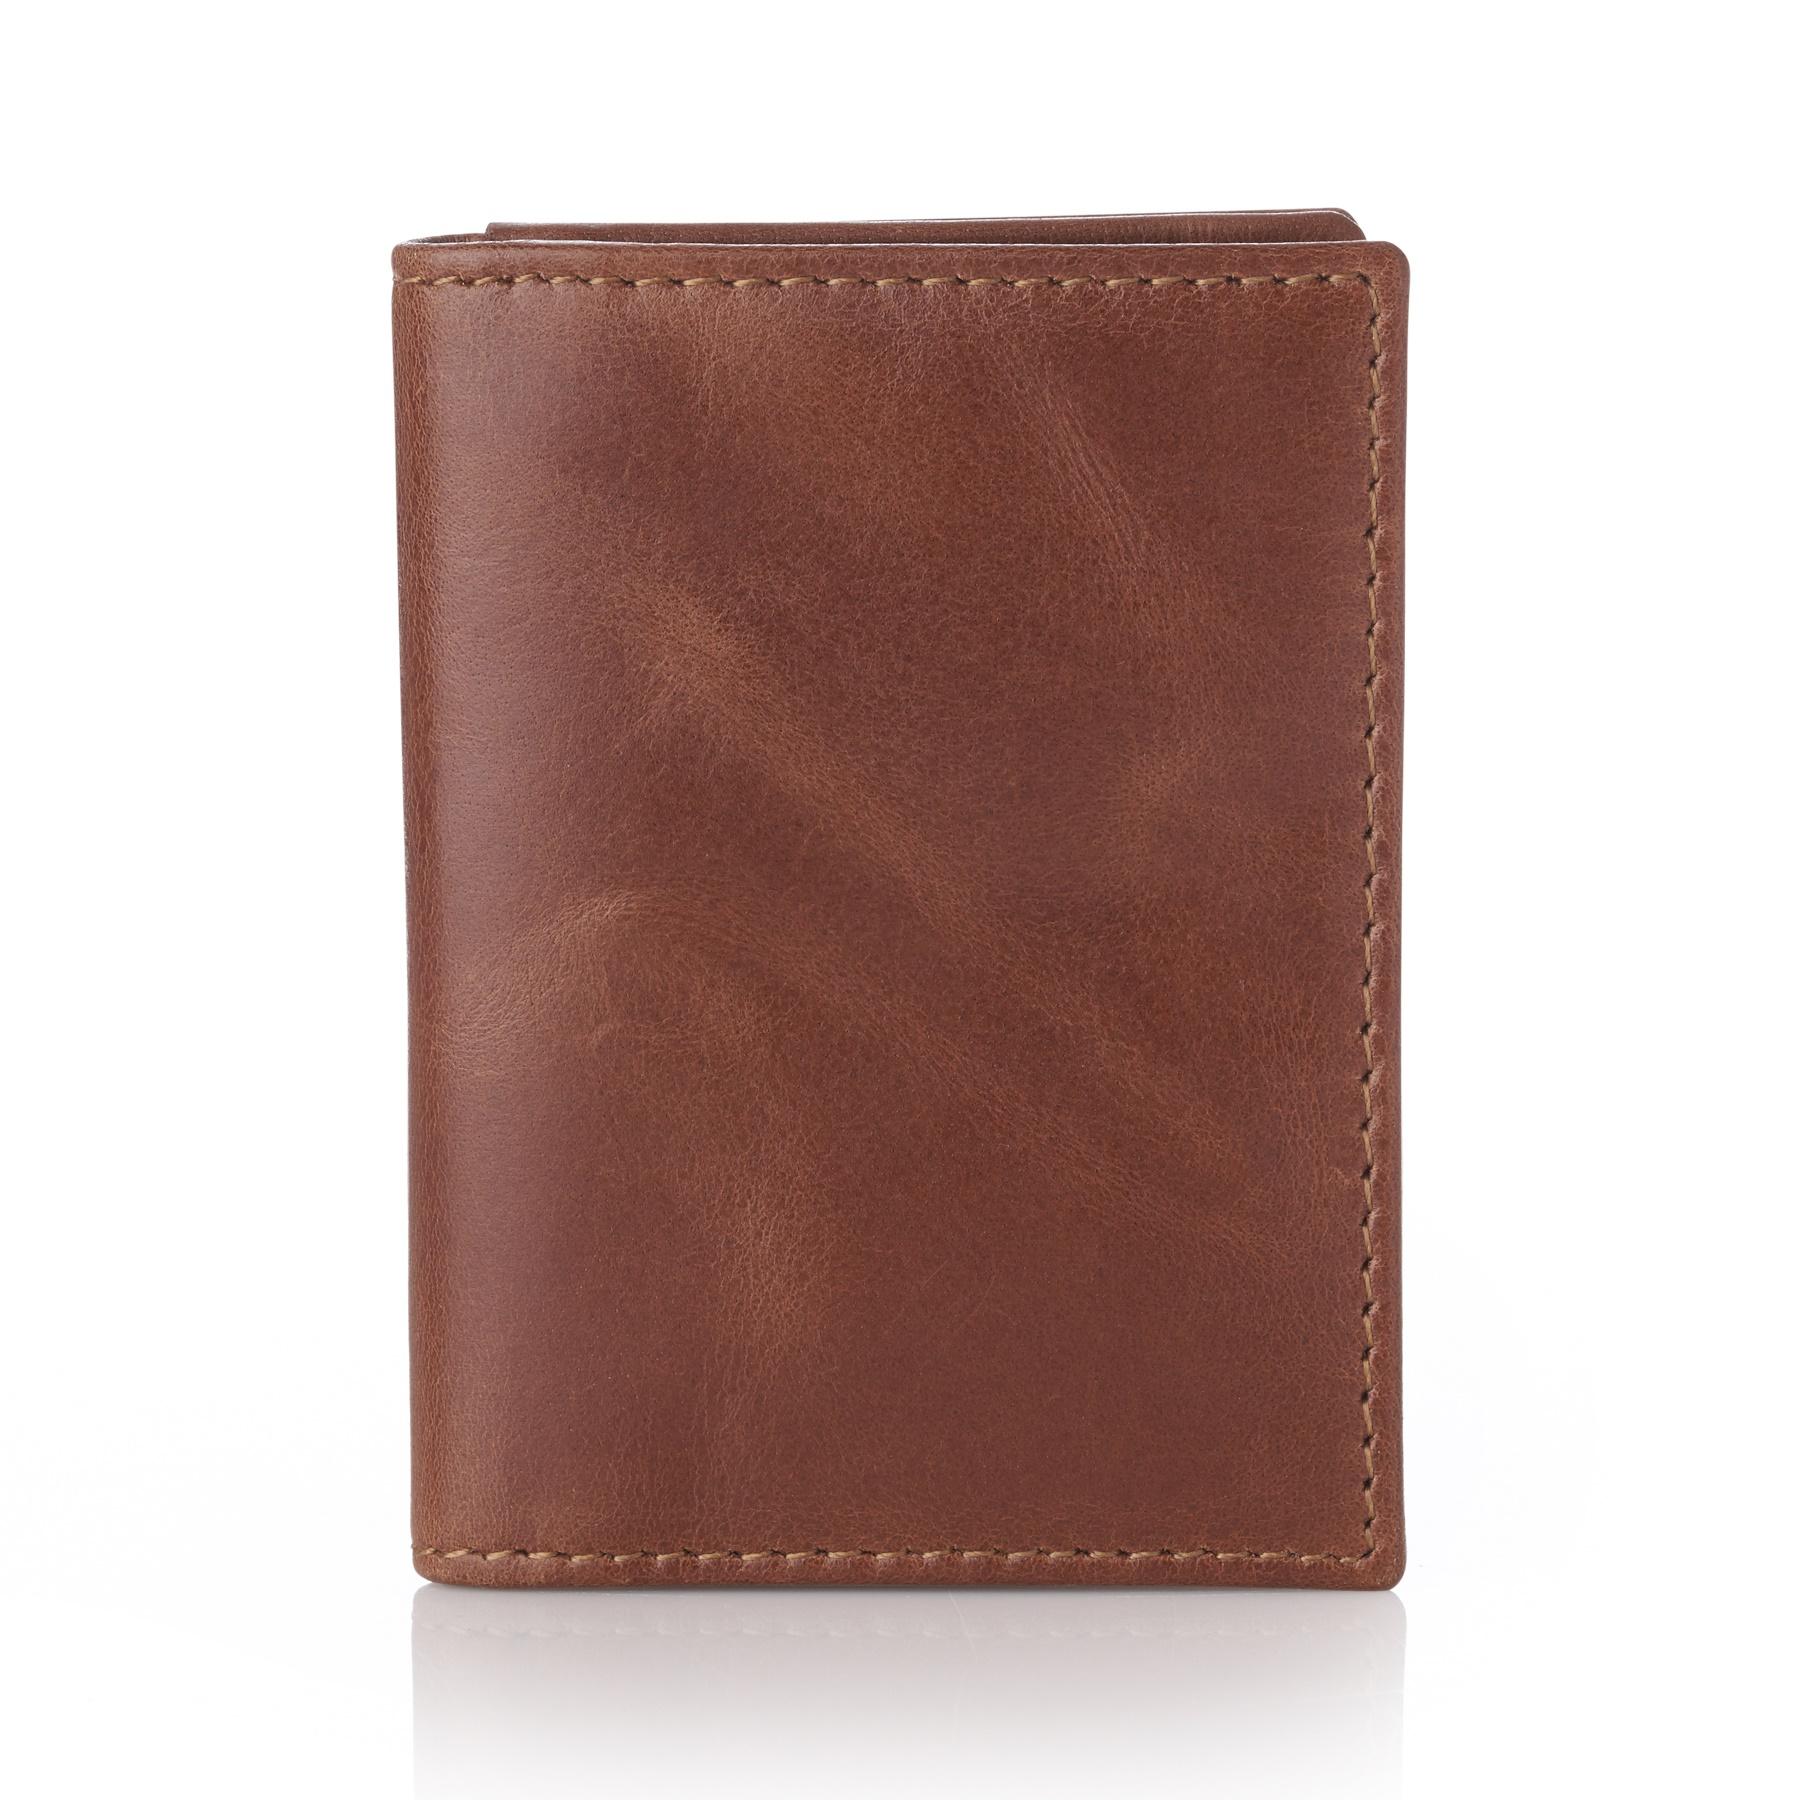 Alpine-Swiss-RFID-Leather-Business-Card-Wallet-Minimalist-ID-Window-Card-Holder thumbnail 22